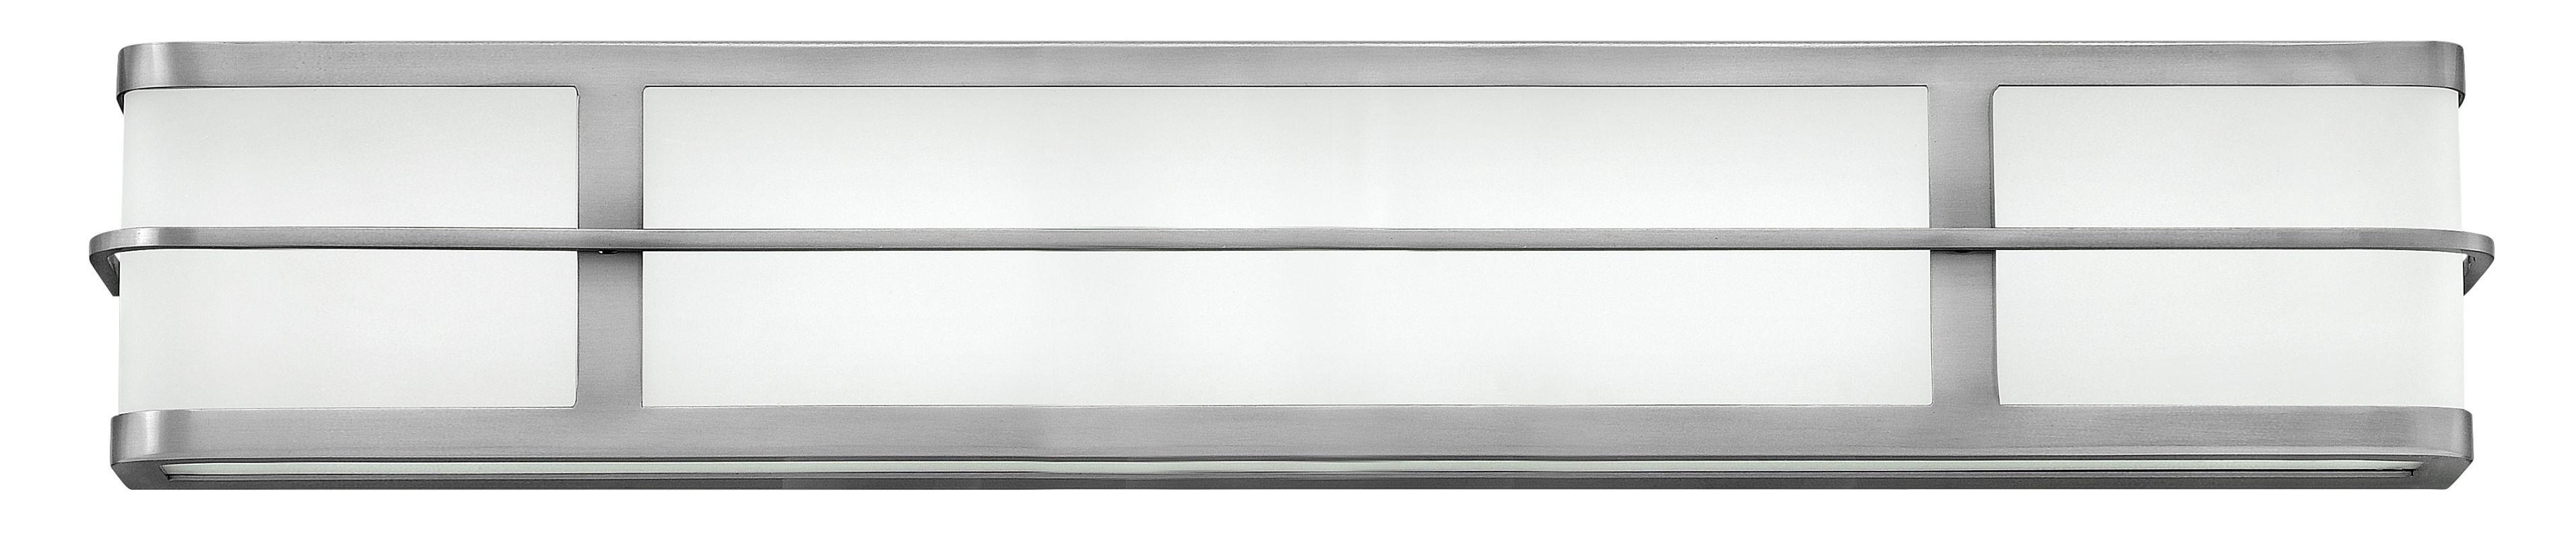 Hinkley Lighting 54814 2 Light ADA Compliant LED Bathroom Bath Bar